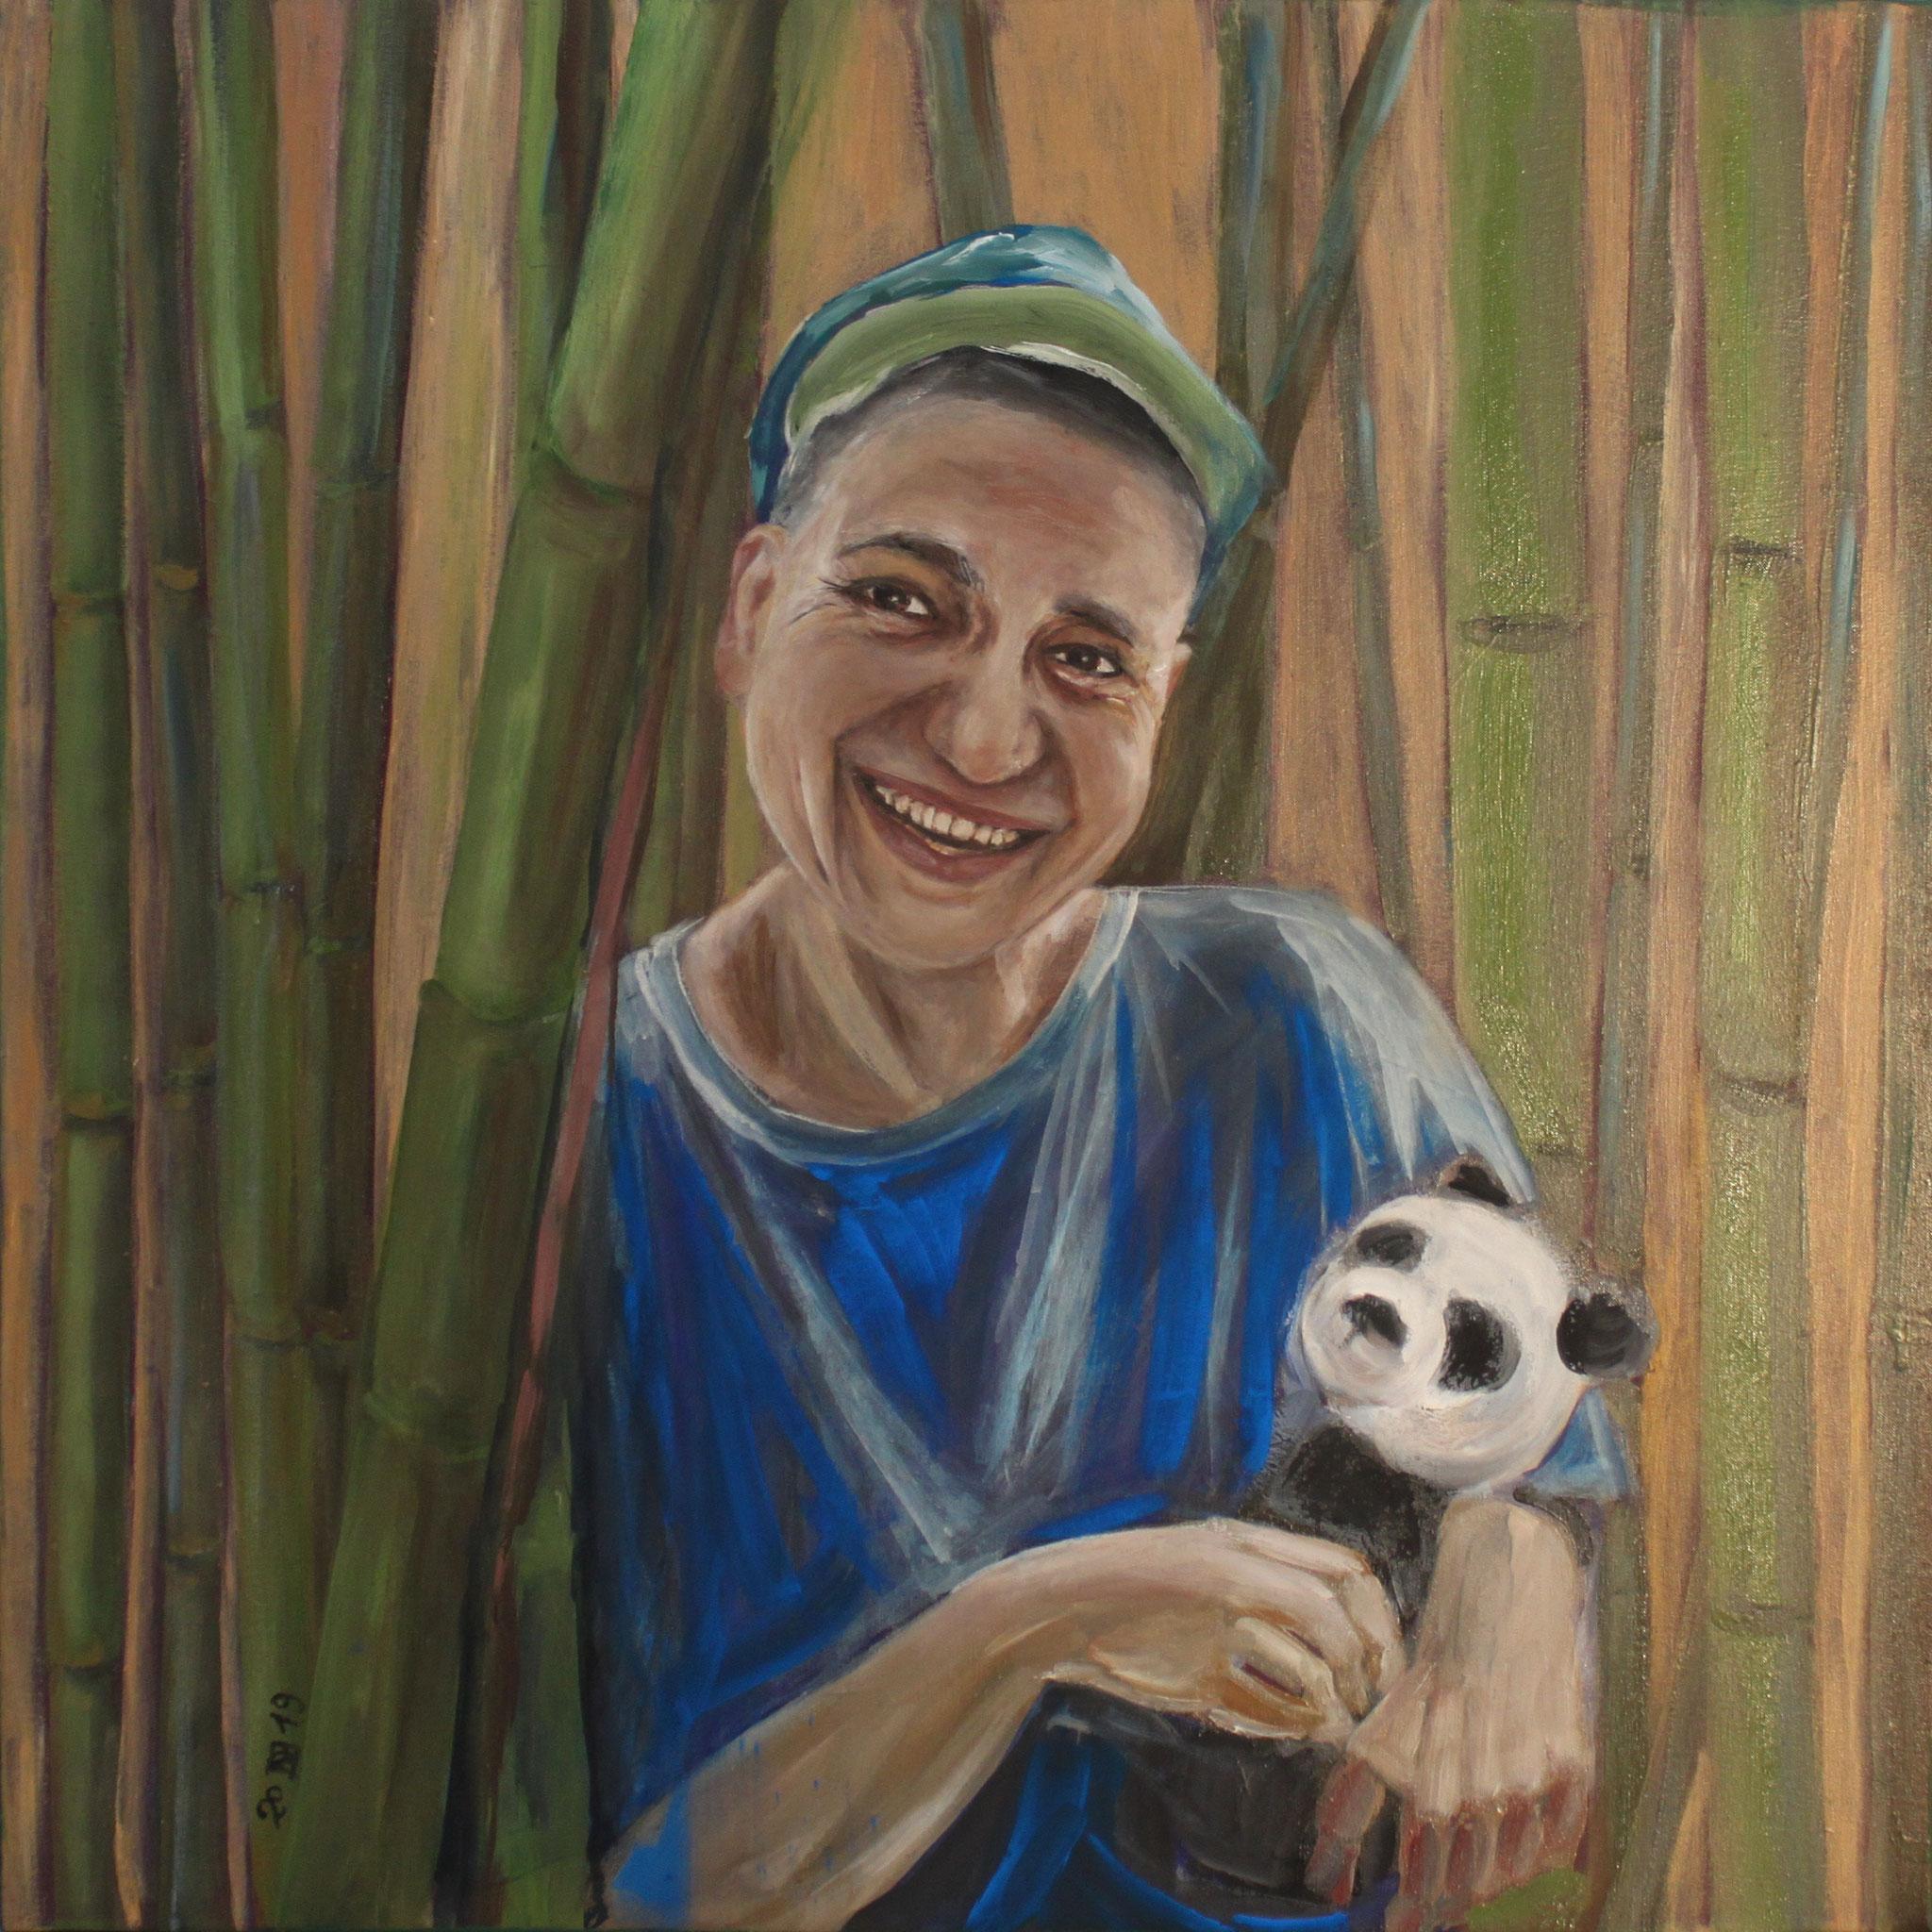 Manuela, 2019, Öl auf Leinwand, 80 cm x 80 cm x 4 cm